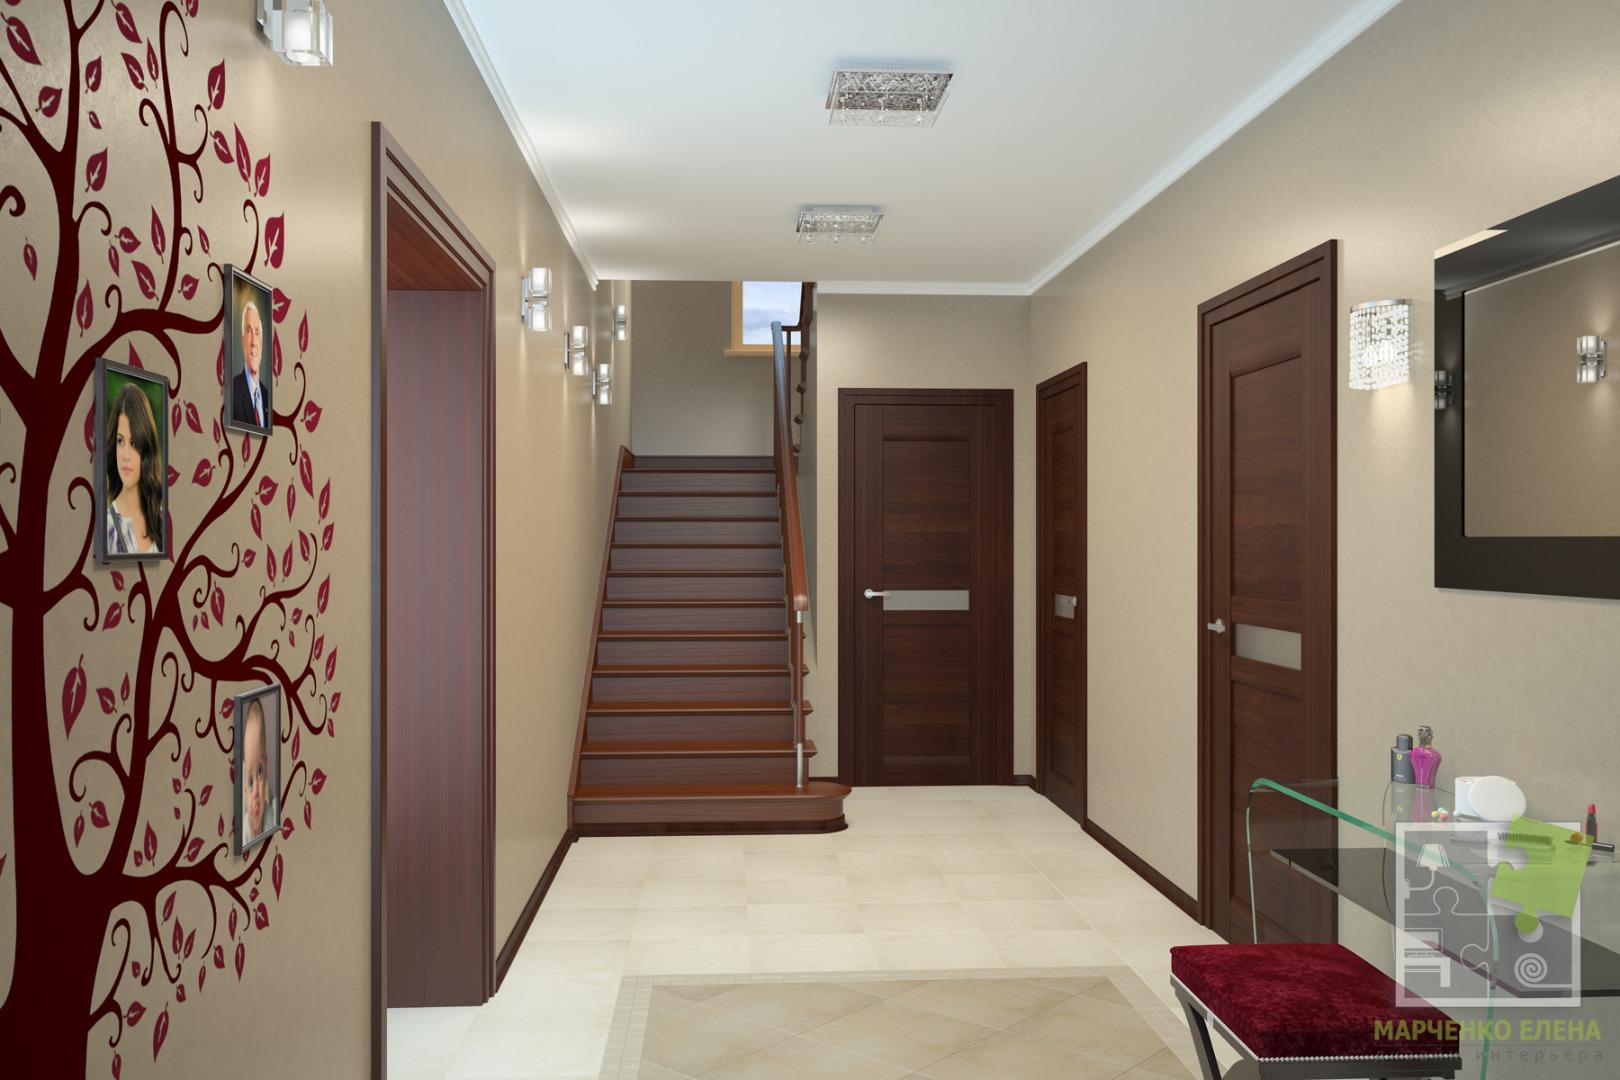 Интерьер коридора в доме фото